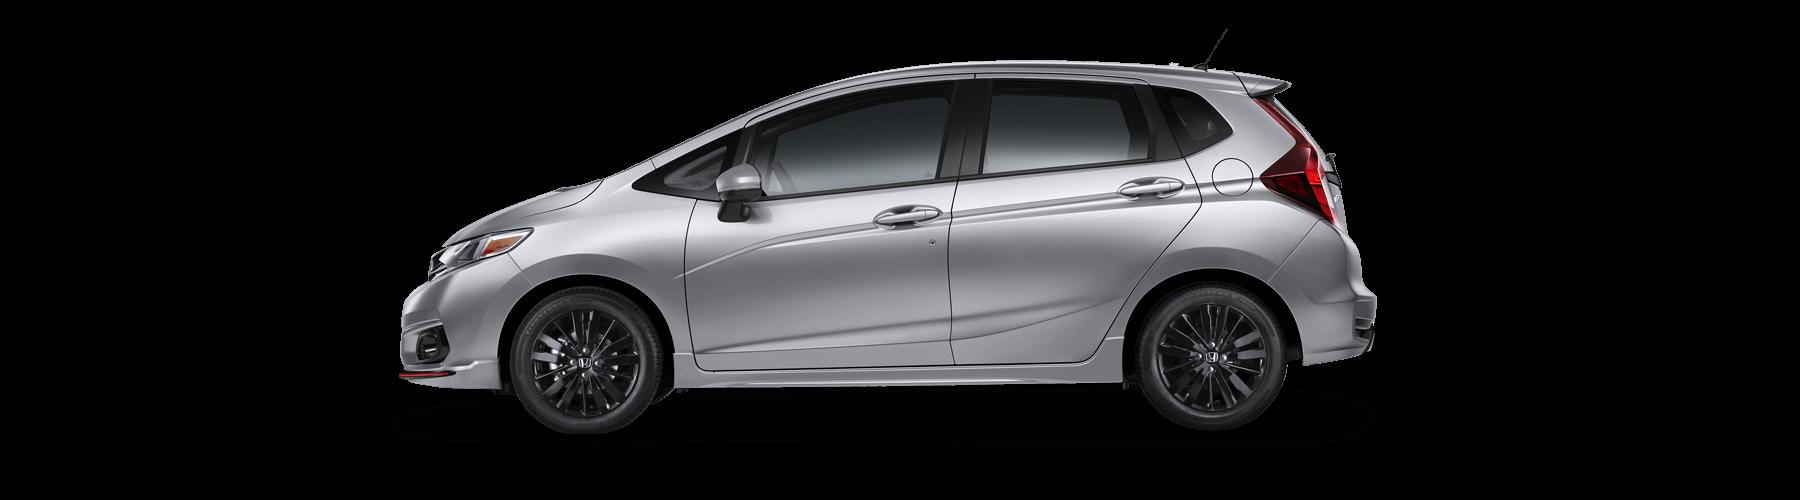 2018 Honda Fit Side Profile